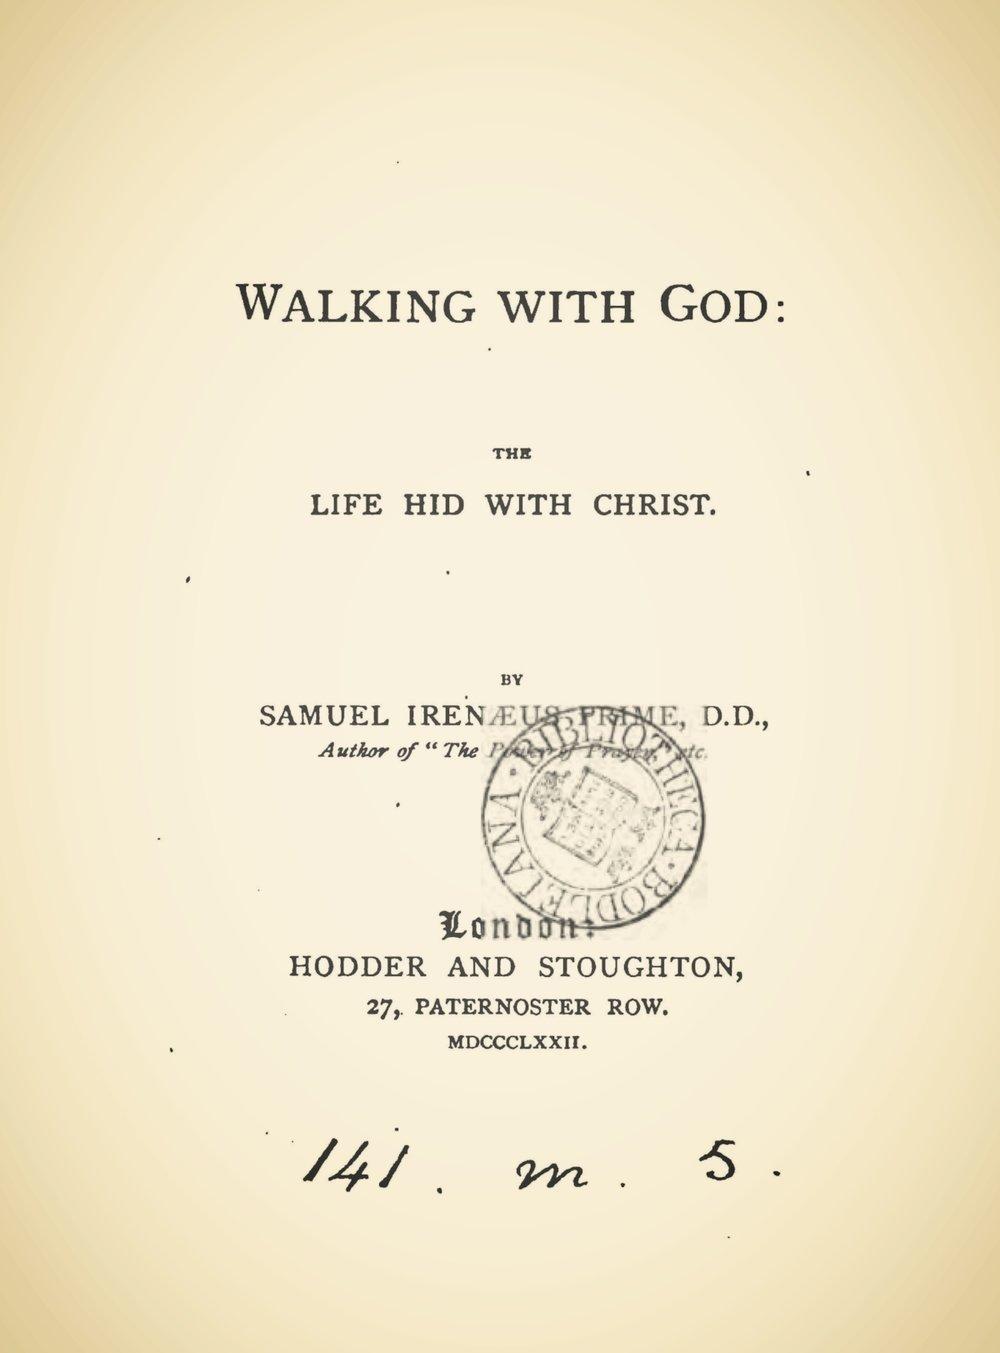 Prime, Samuel Irenaeus, Walking With God Title Page.jpg